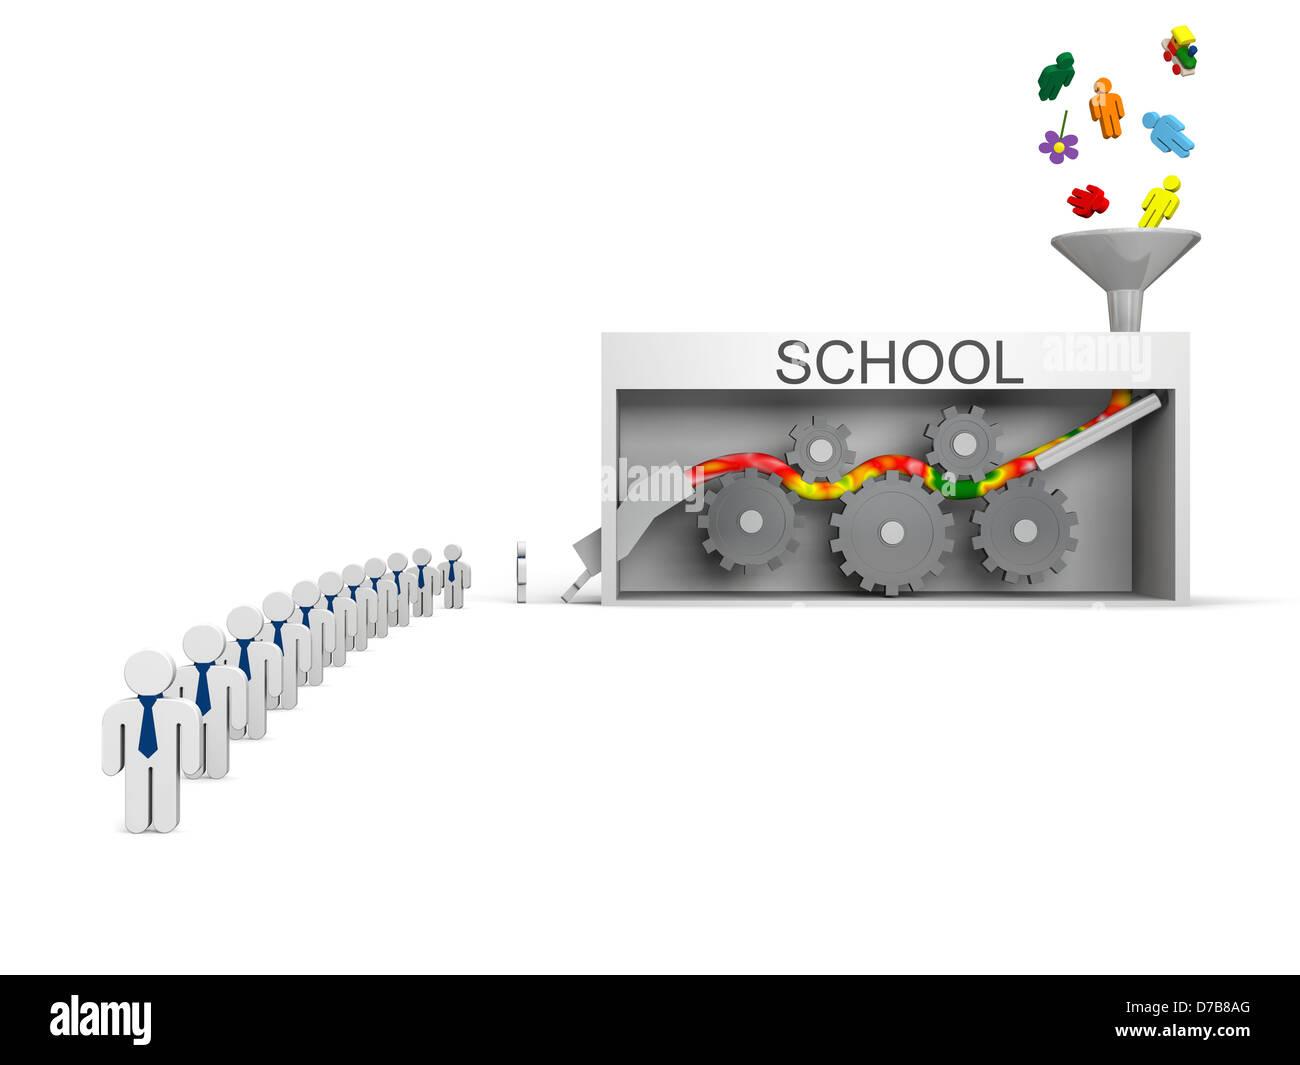 School machine, concept of schools killing creativity producing average worker - Stock Image